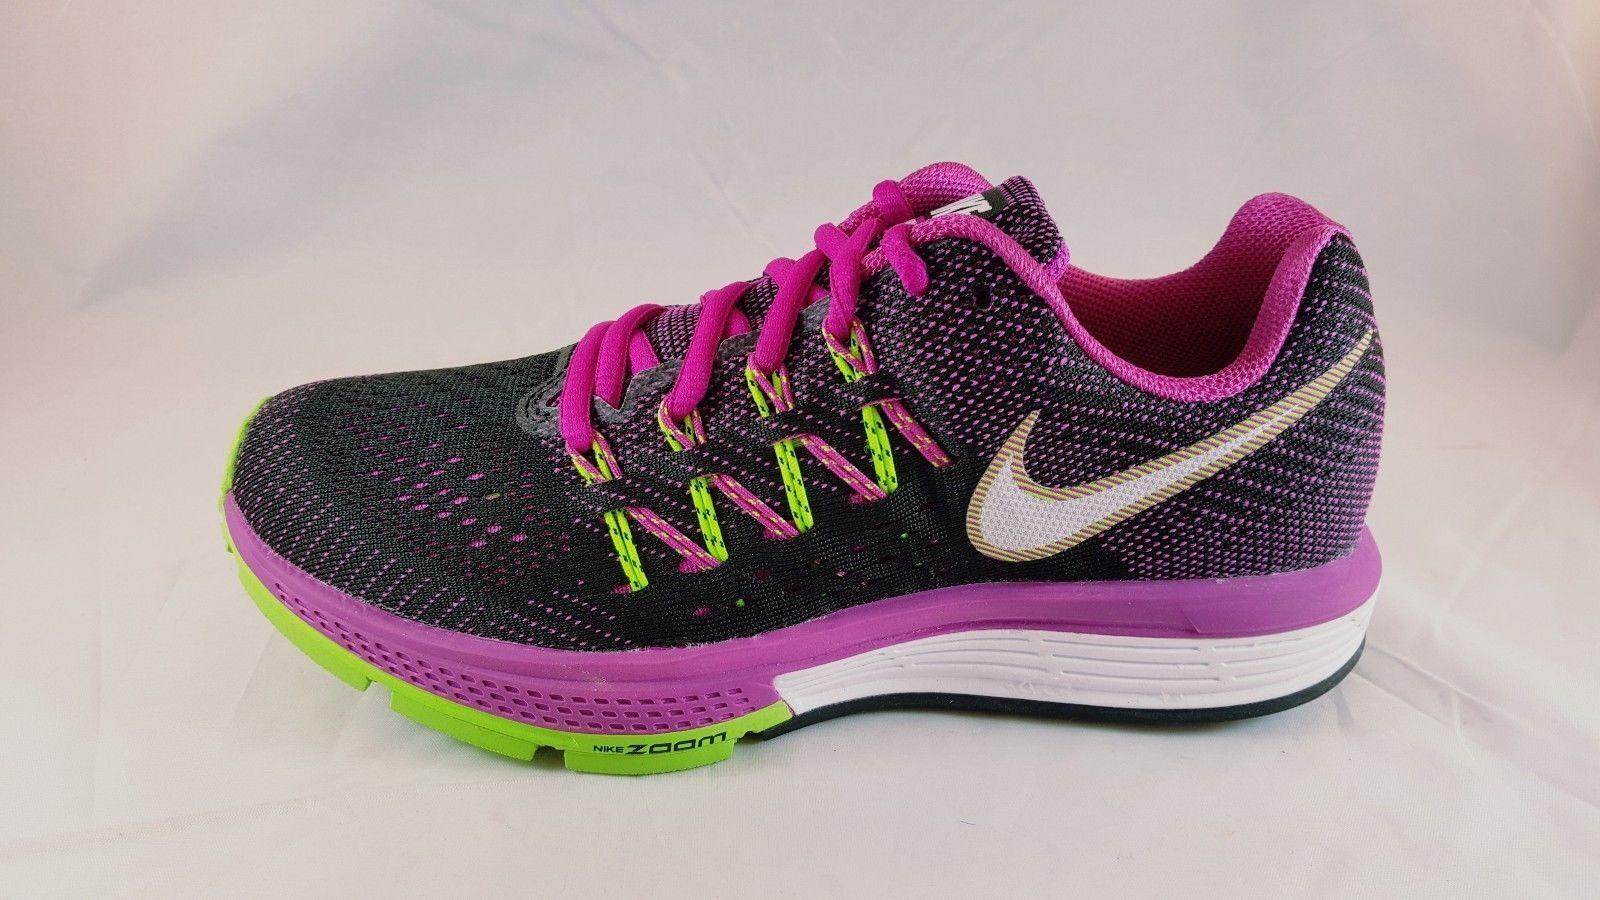 Nike Air Zoom Vomero 10 Women's Women's Women's Running shoes 717441 501 Size 5.5 858bfc